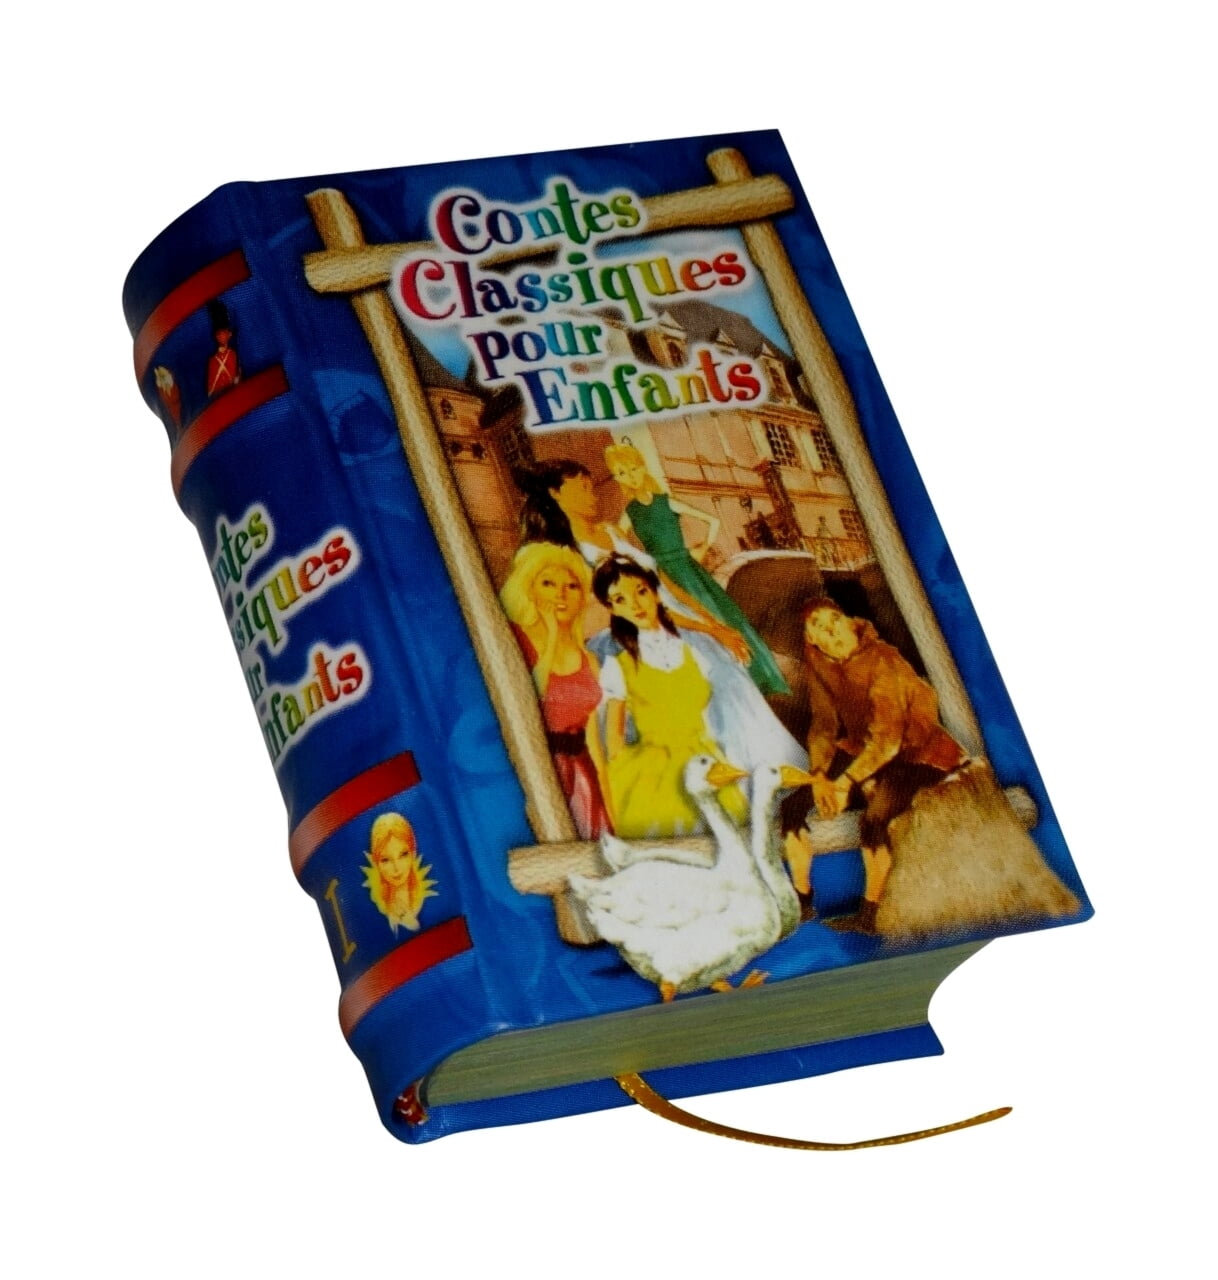 Contes-enfants-miniature-book-libro